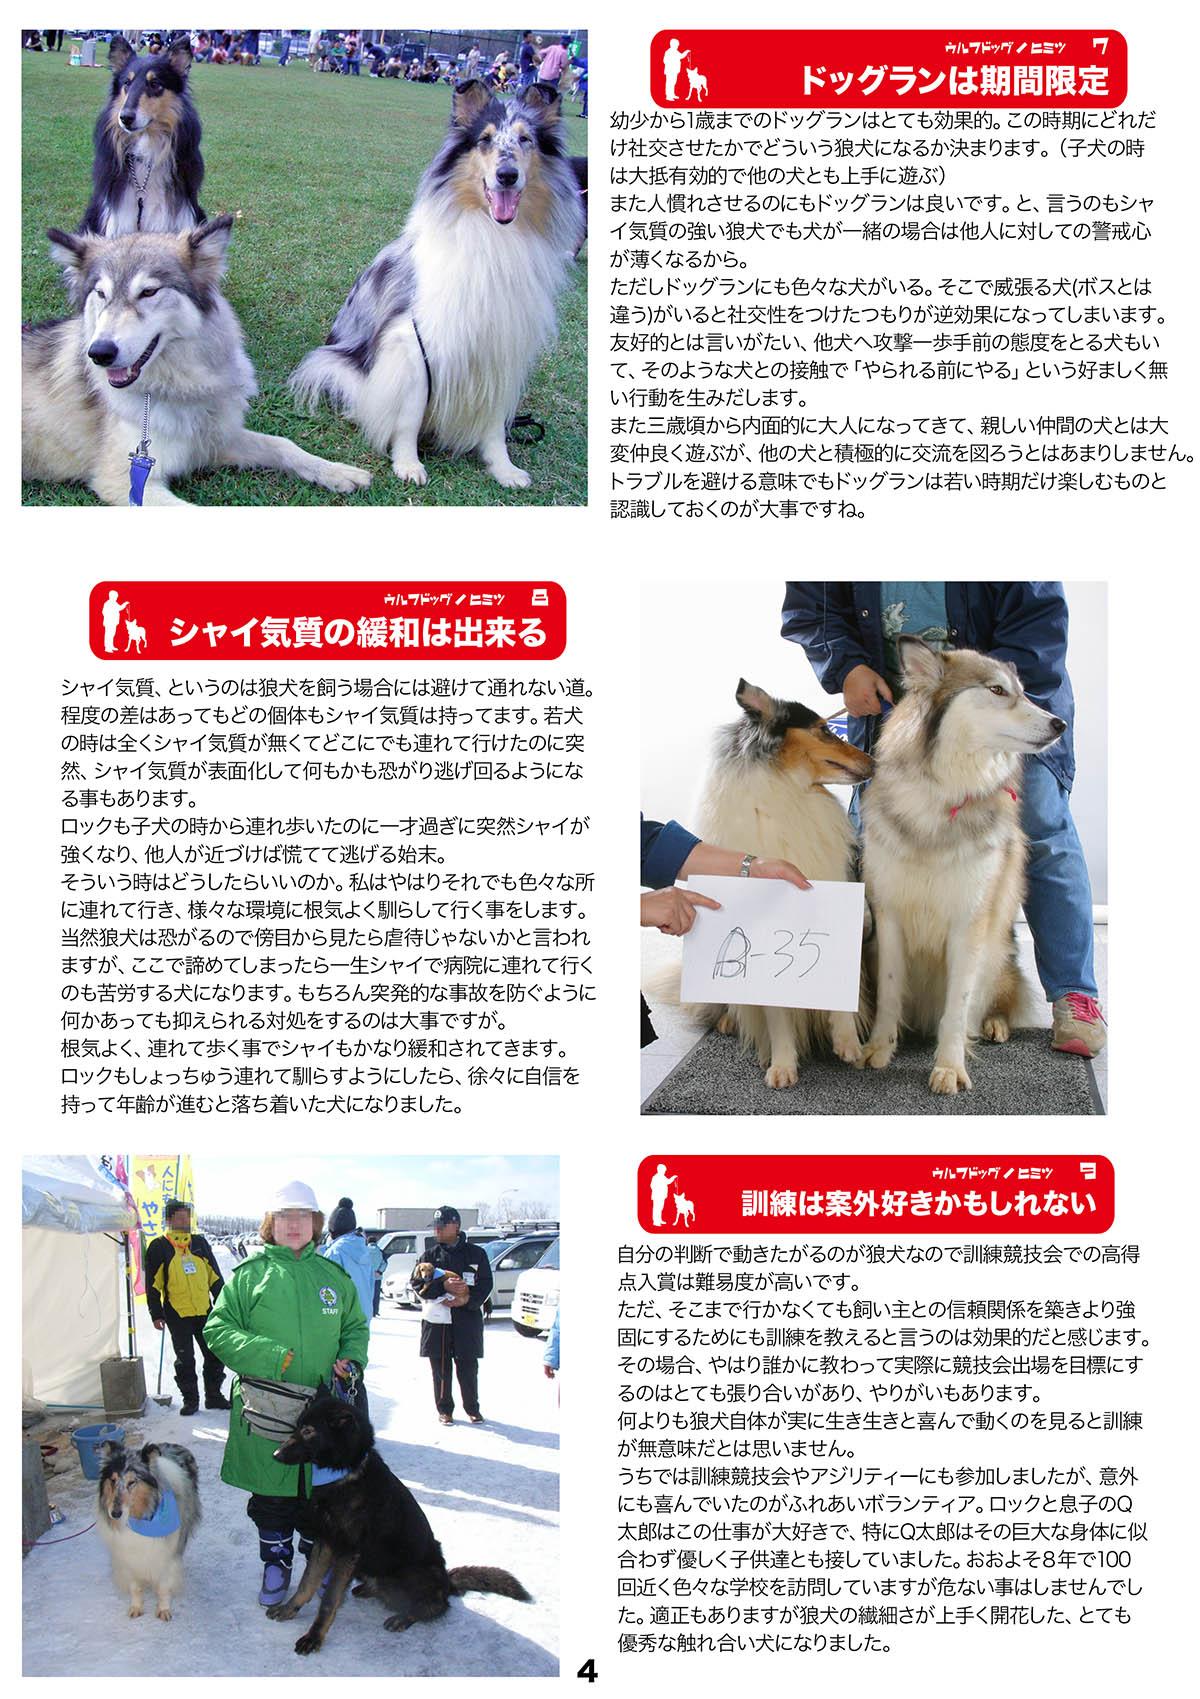 2016_SERIORS STORY 日本狼犬クラブ_06